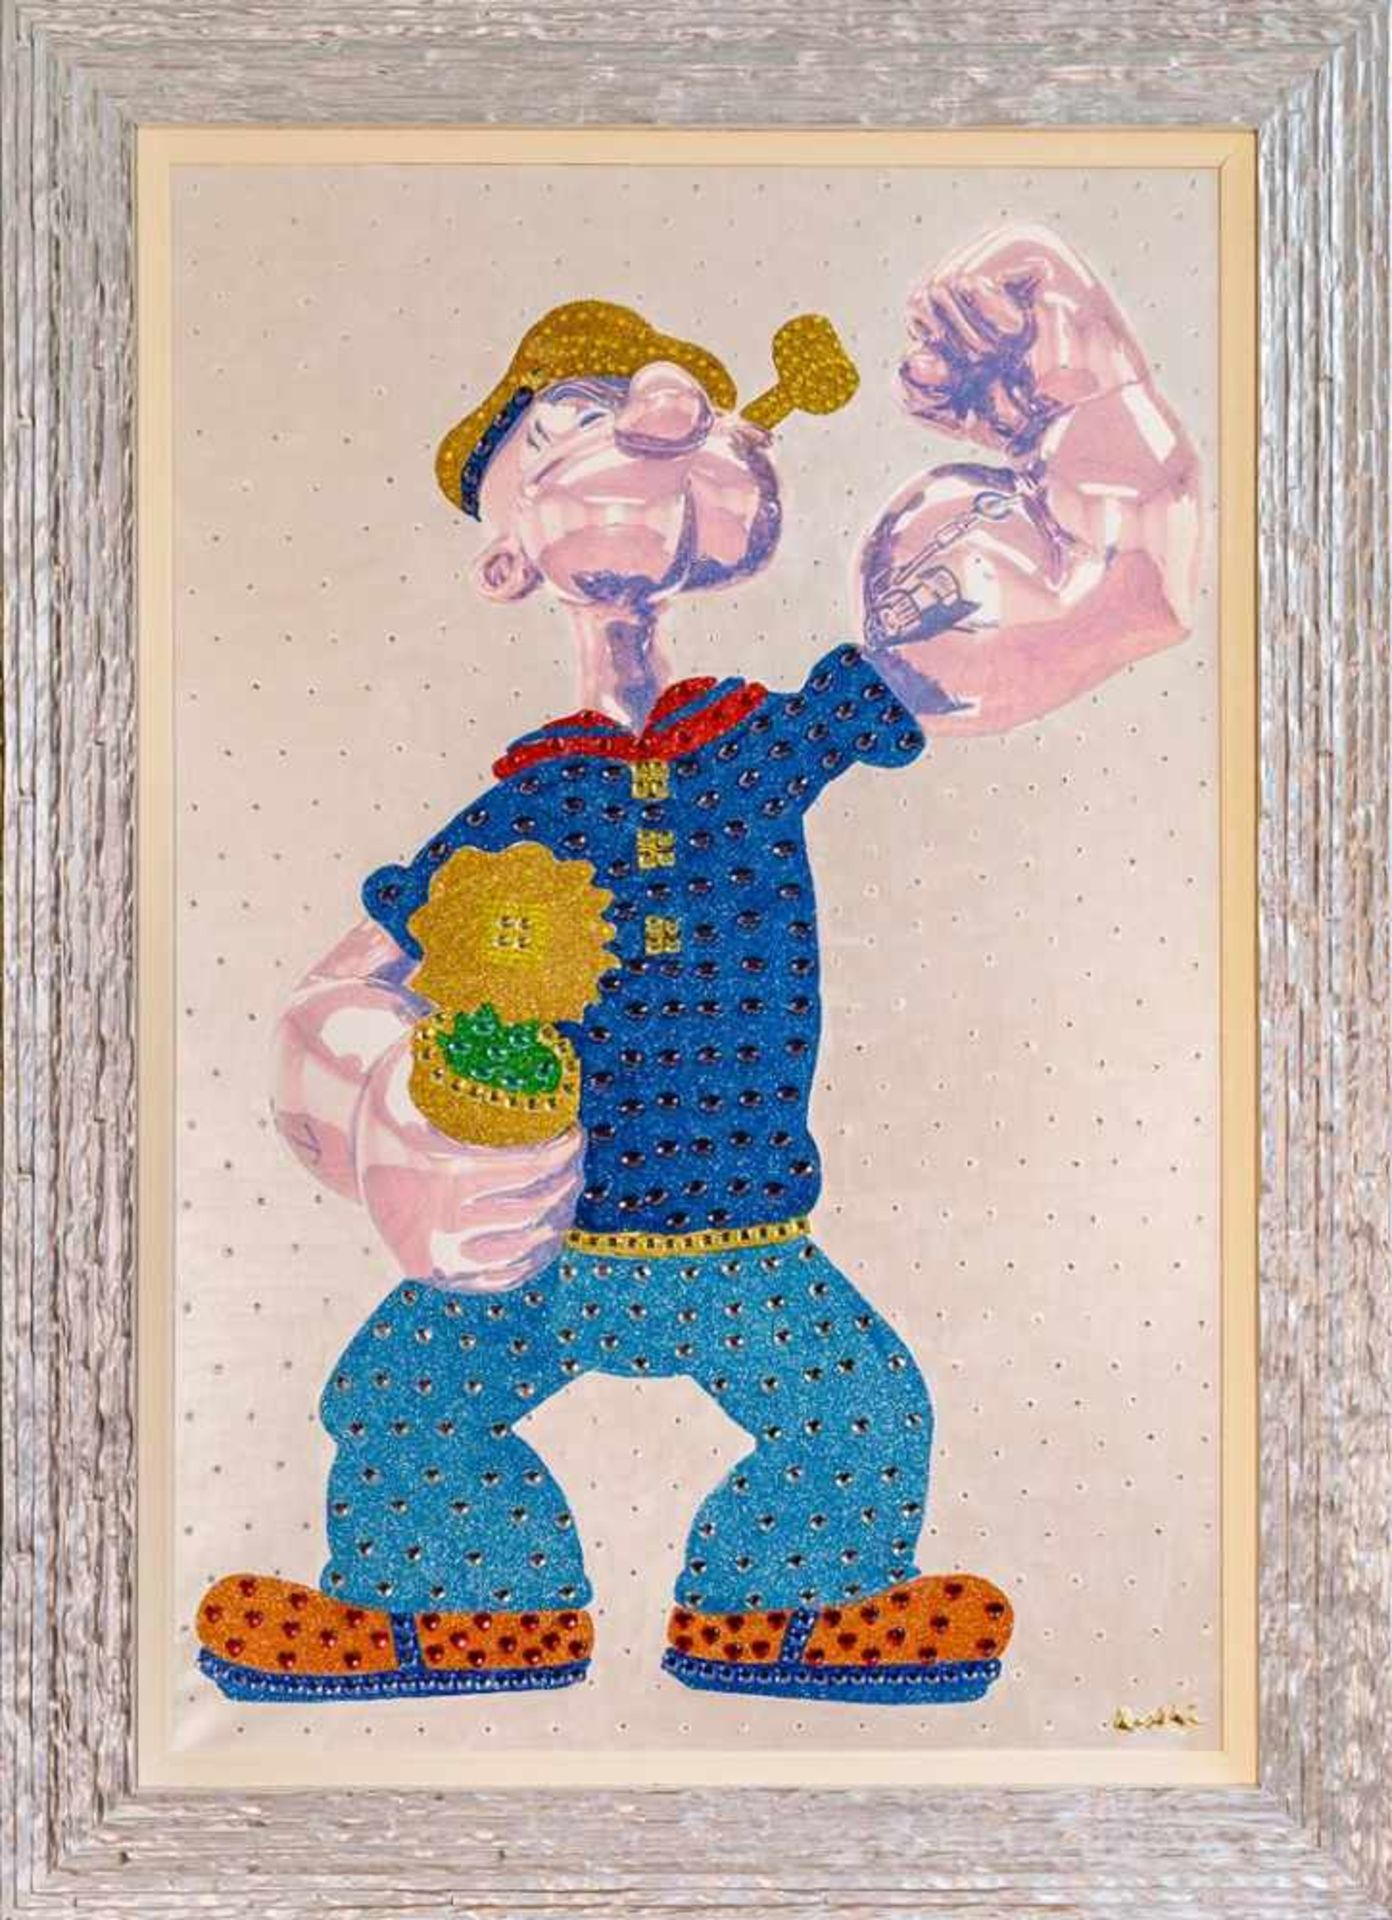 Los 60 - Dondé Daniele (geb. 1950) Popeye Mixed Media auf Leinwand handsigniert rückseitig 130 x 100 cm